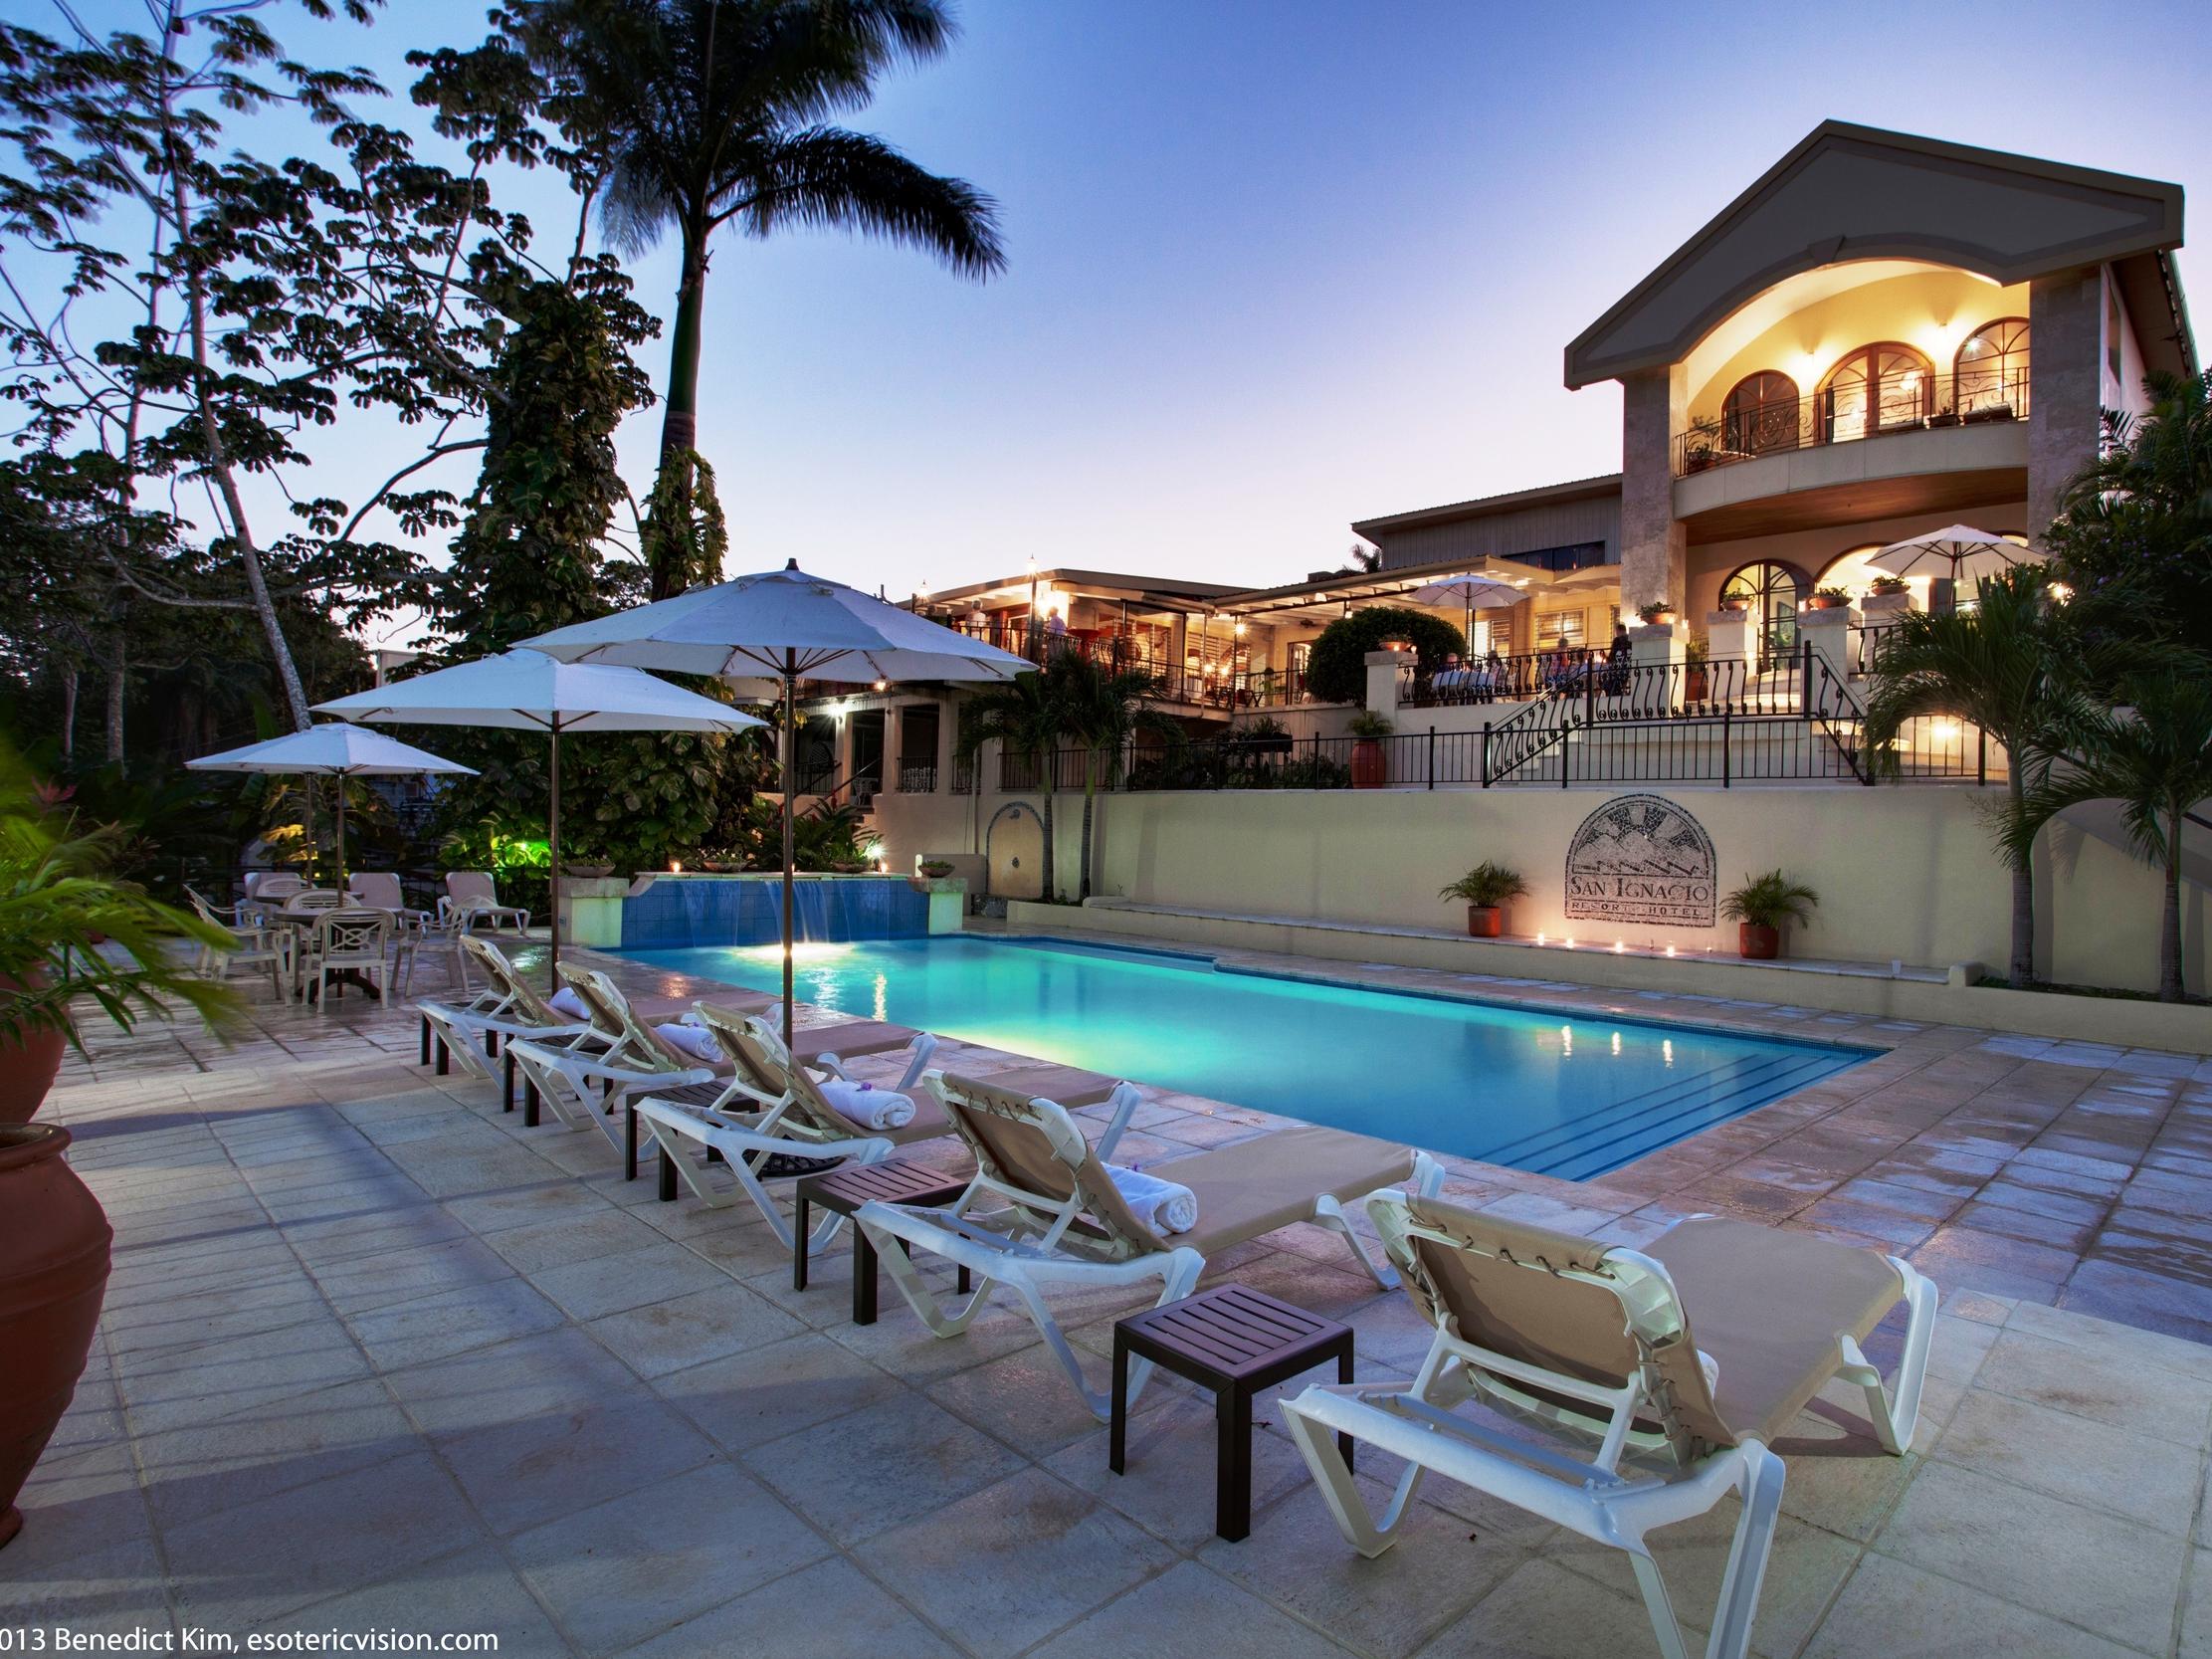 The pool at the San Ignacio Resort Hotel